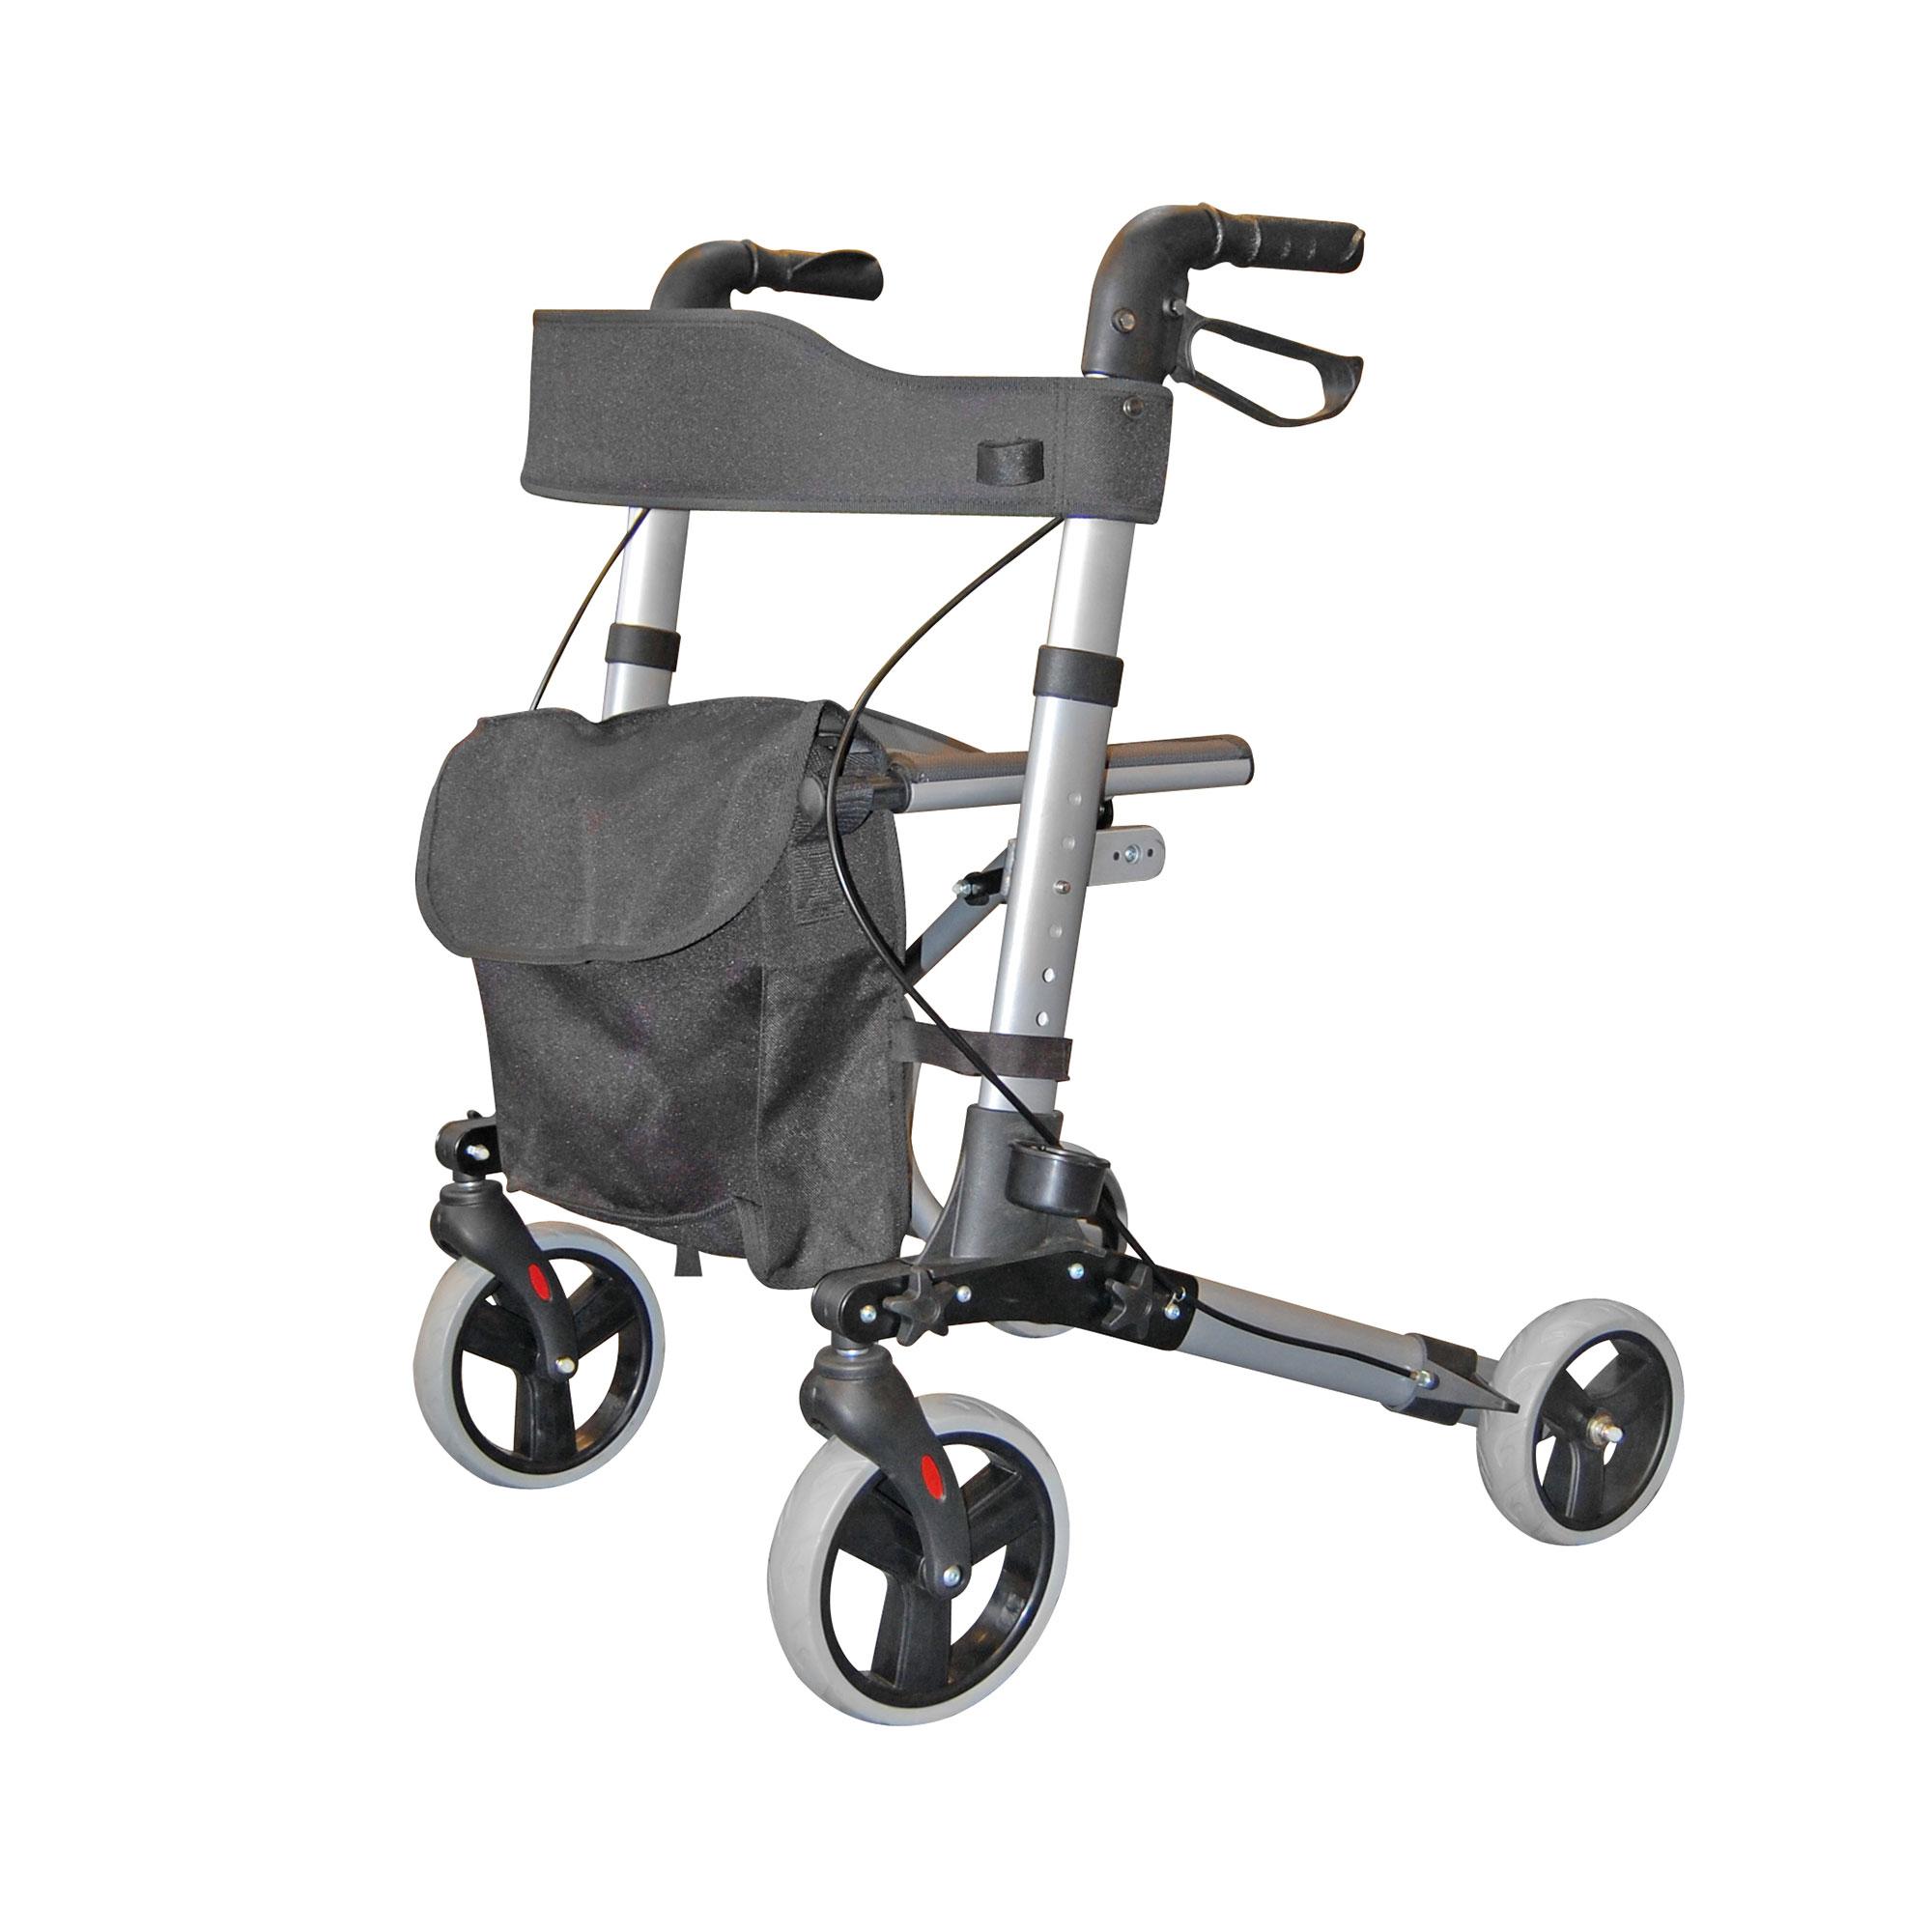 2465 City Walker Lightweight Folding Rollator Roma